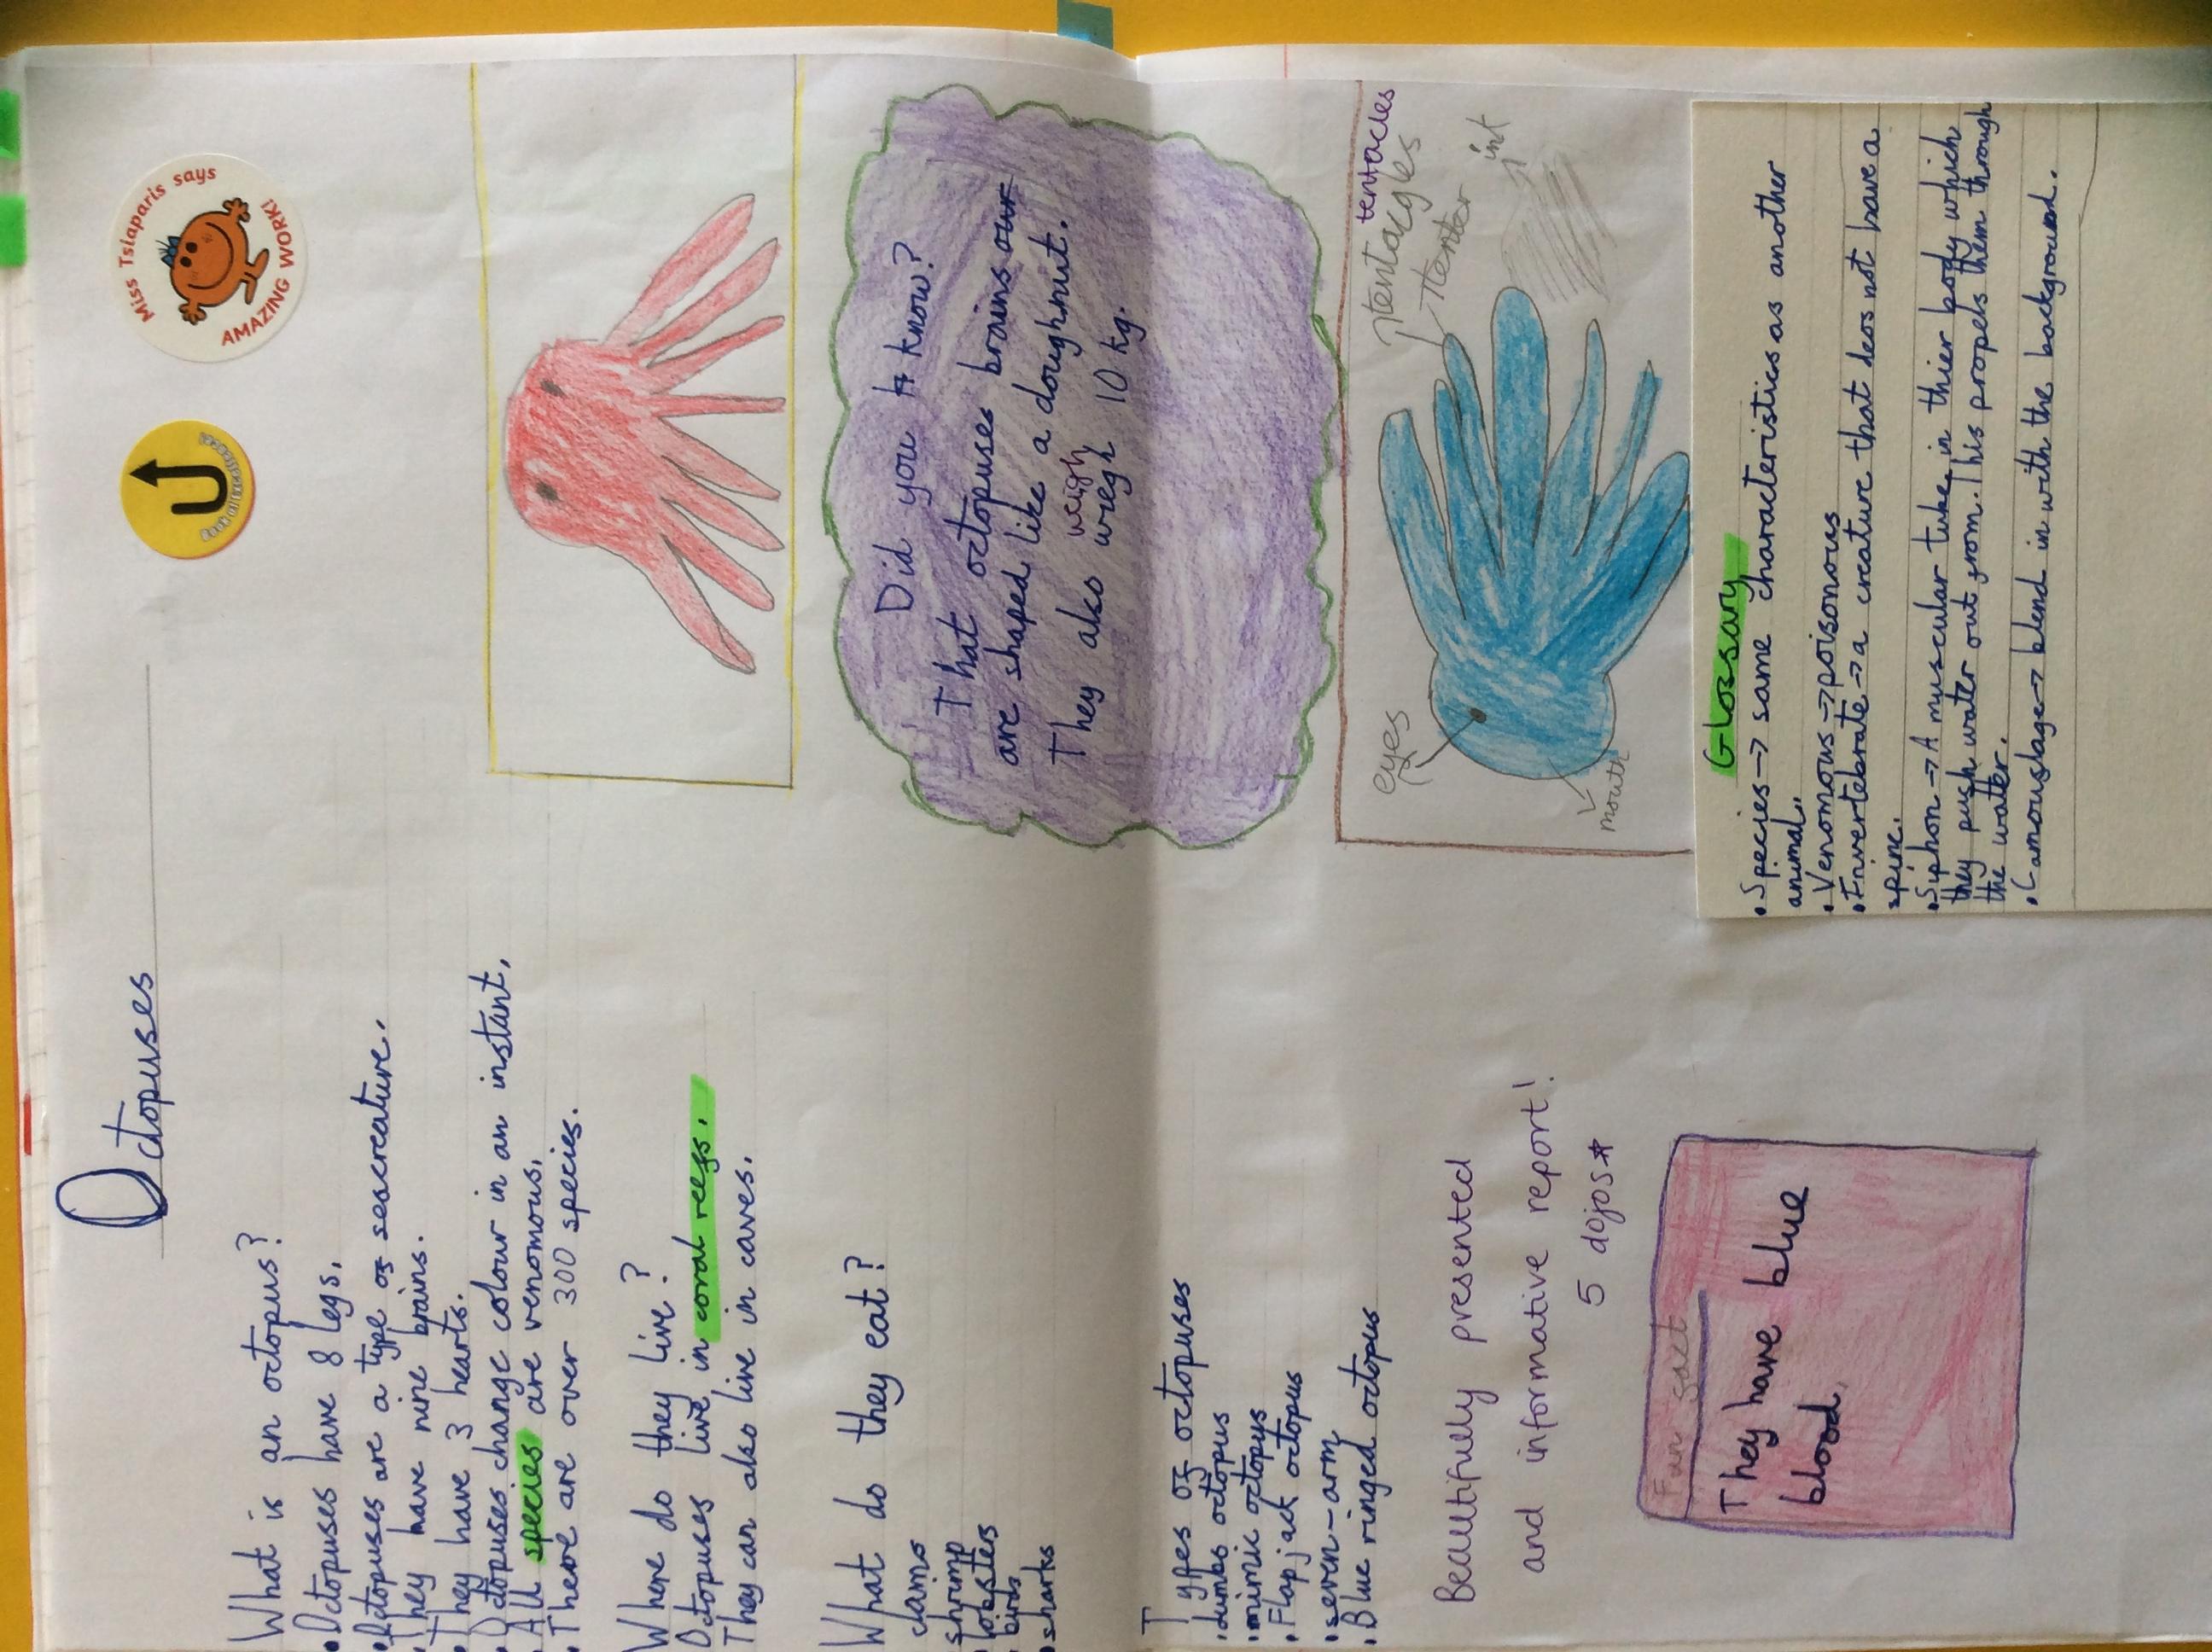 Bethan's fantatstic report!